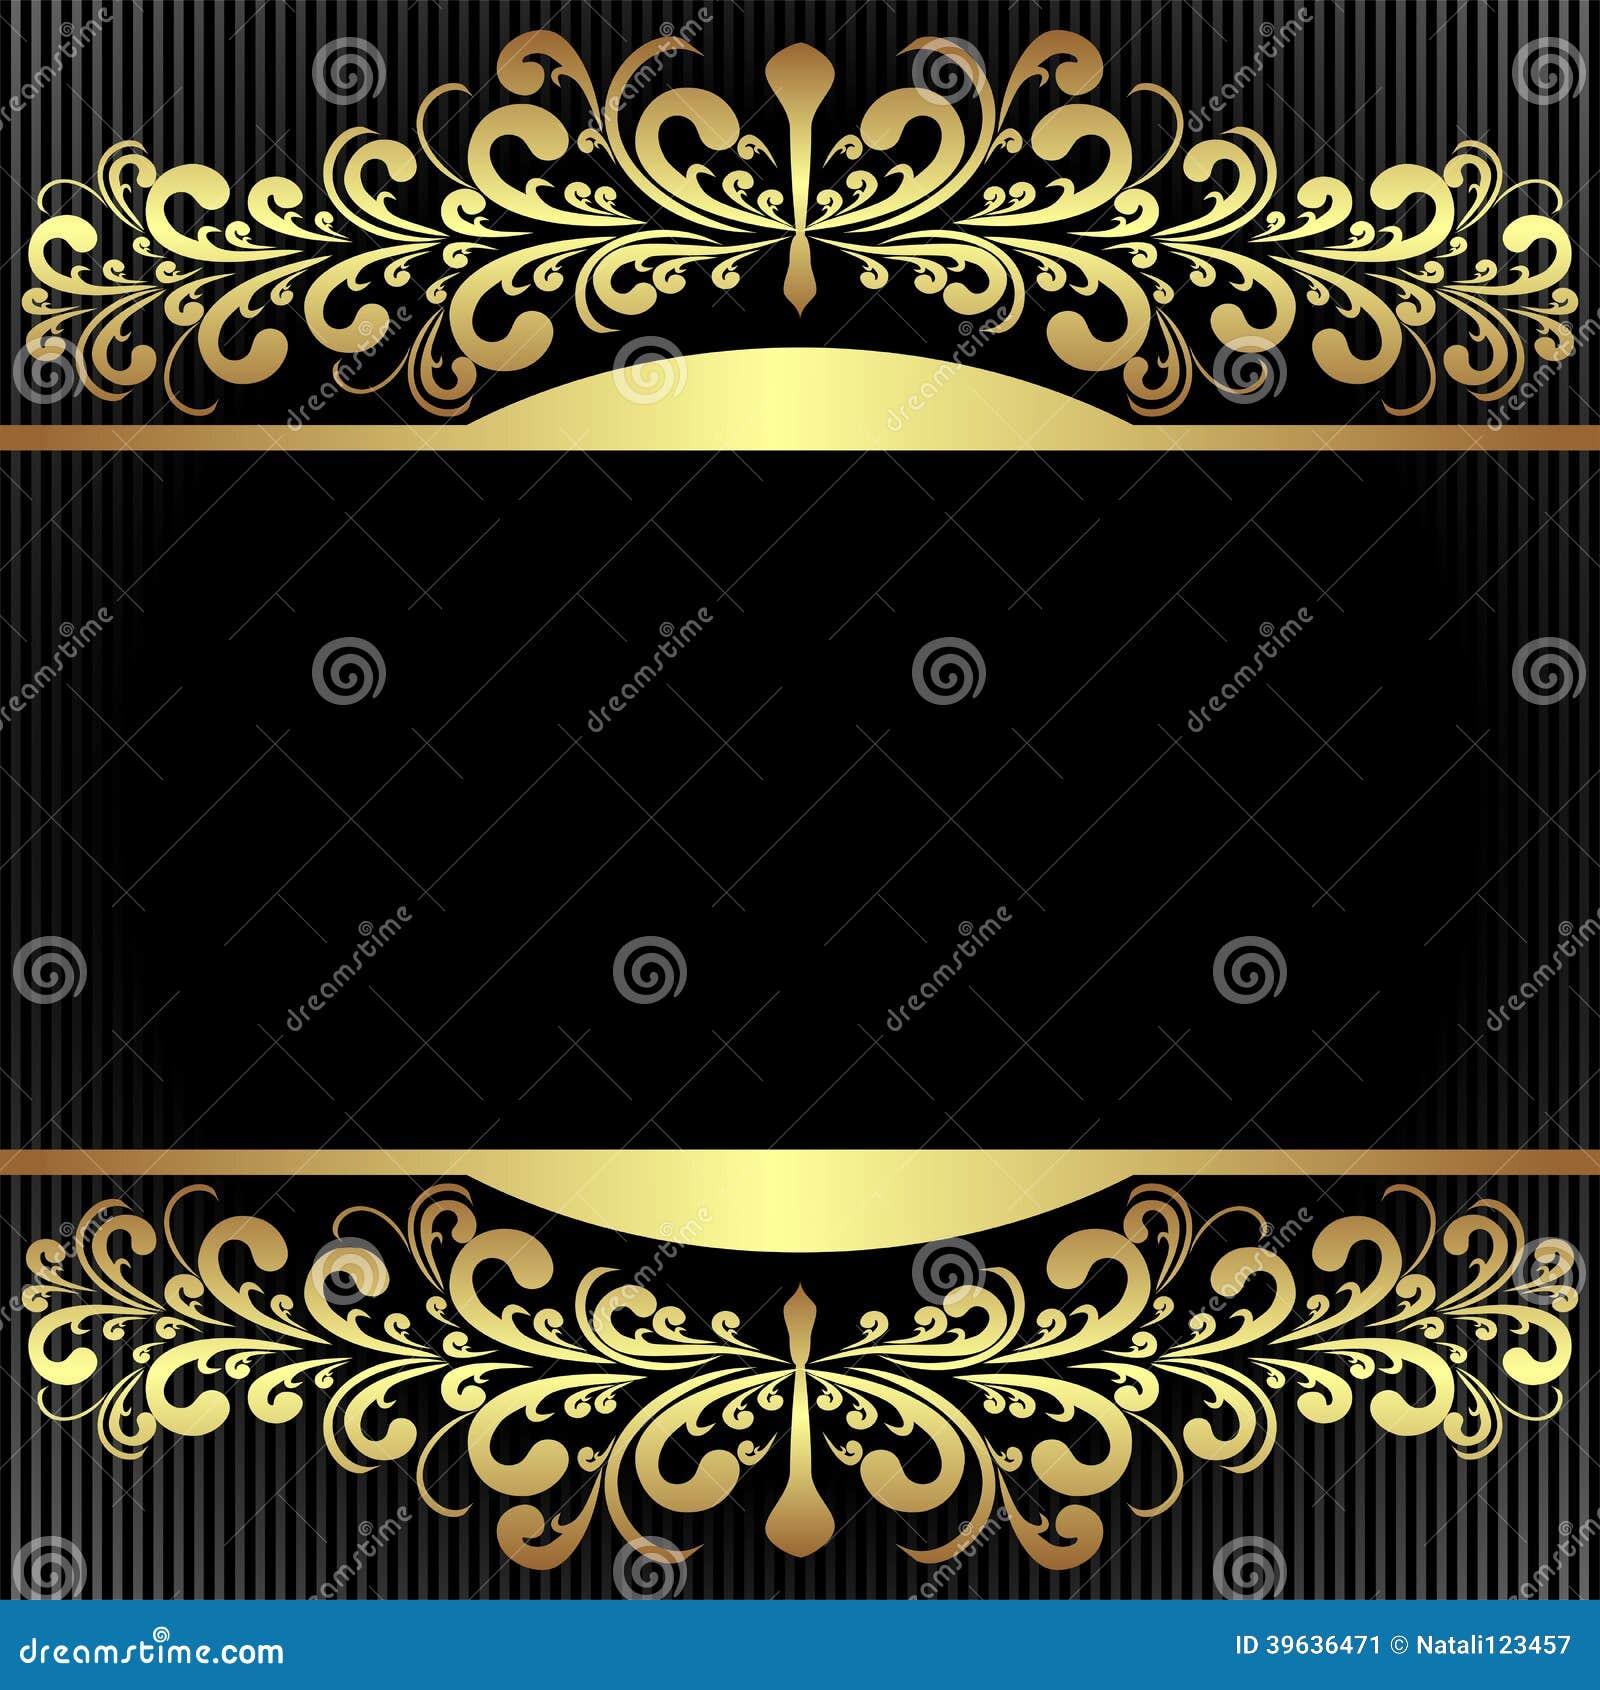 Elegant Black Background With Royal Golden Borders Stock